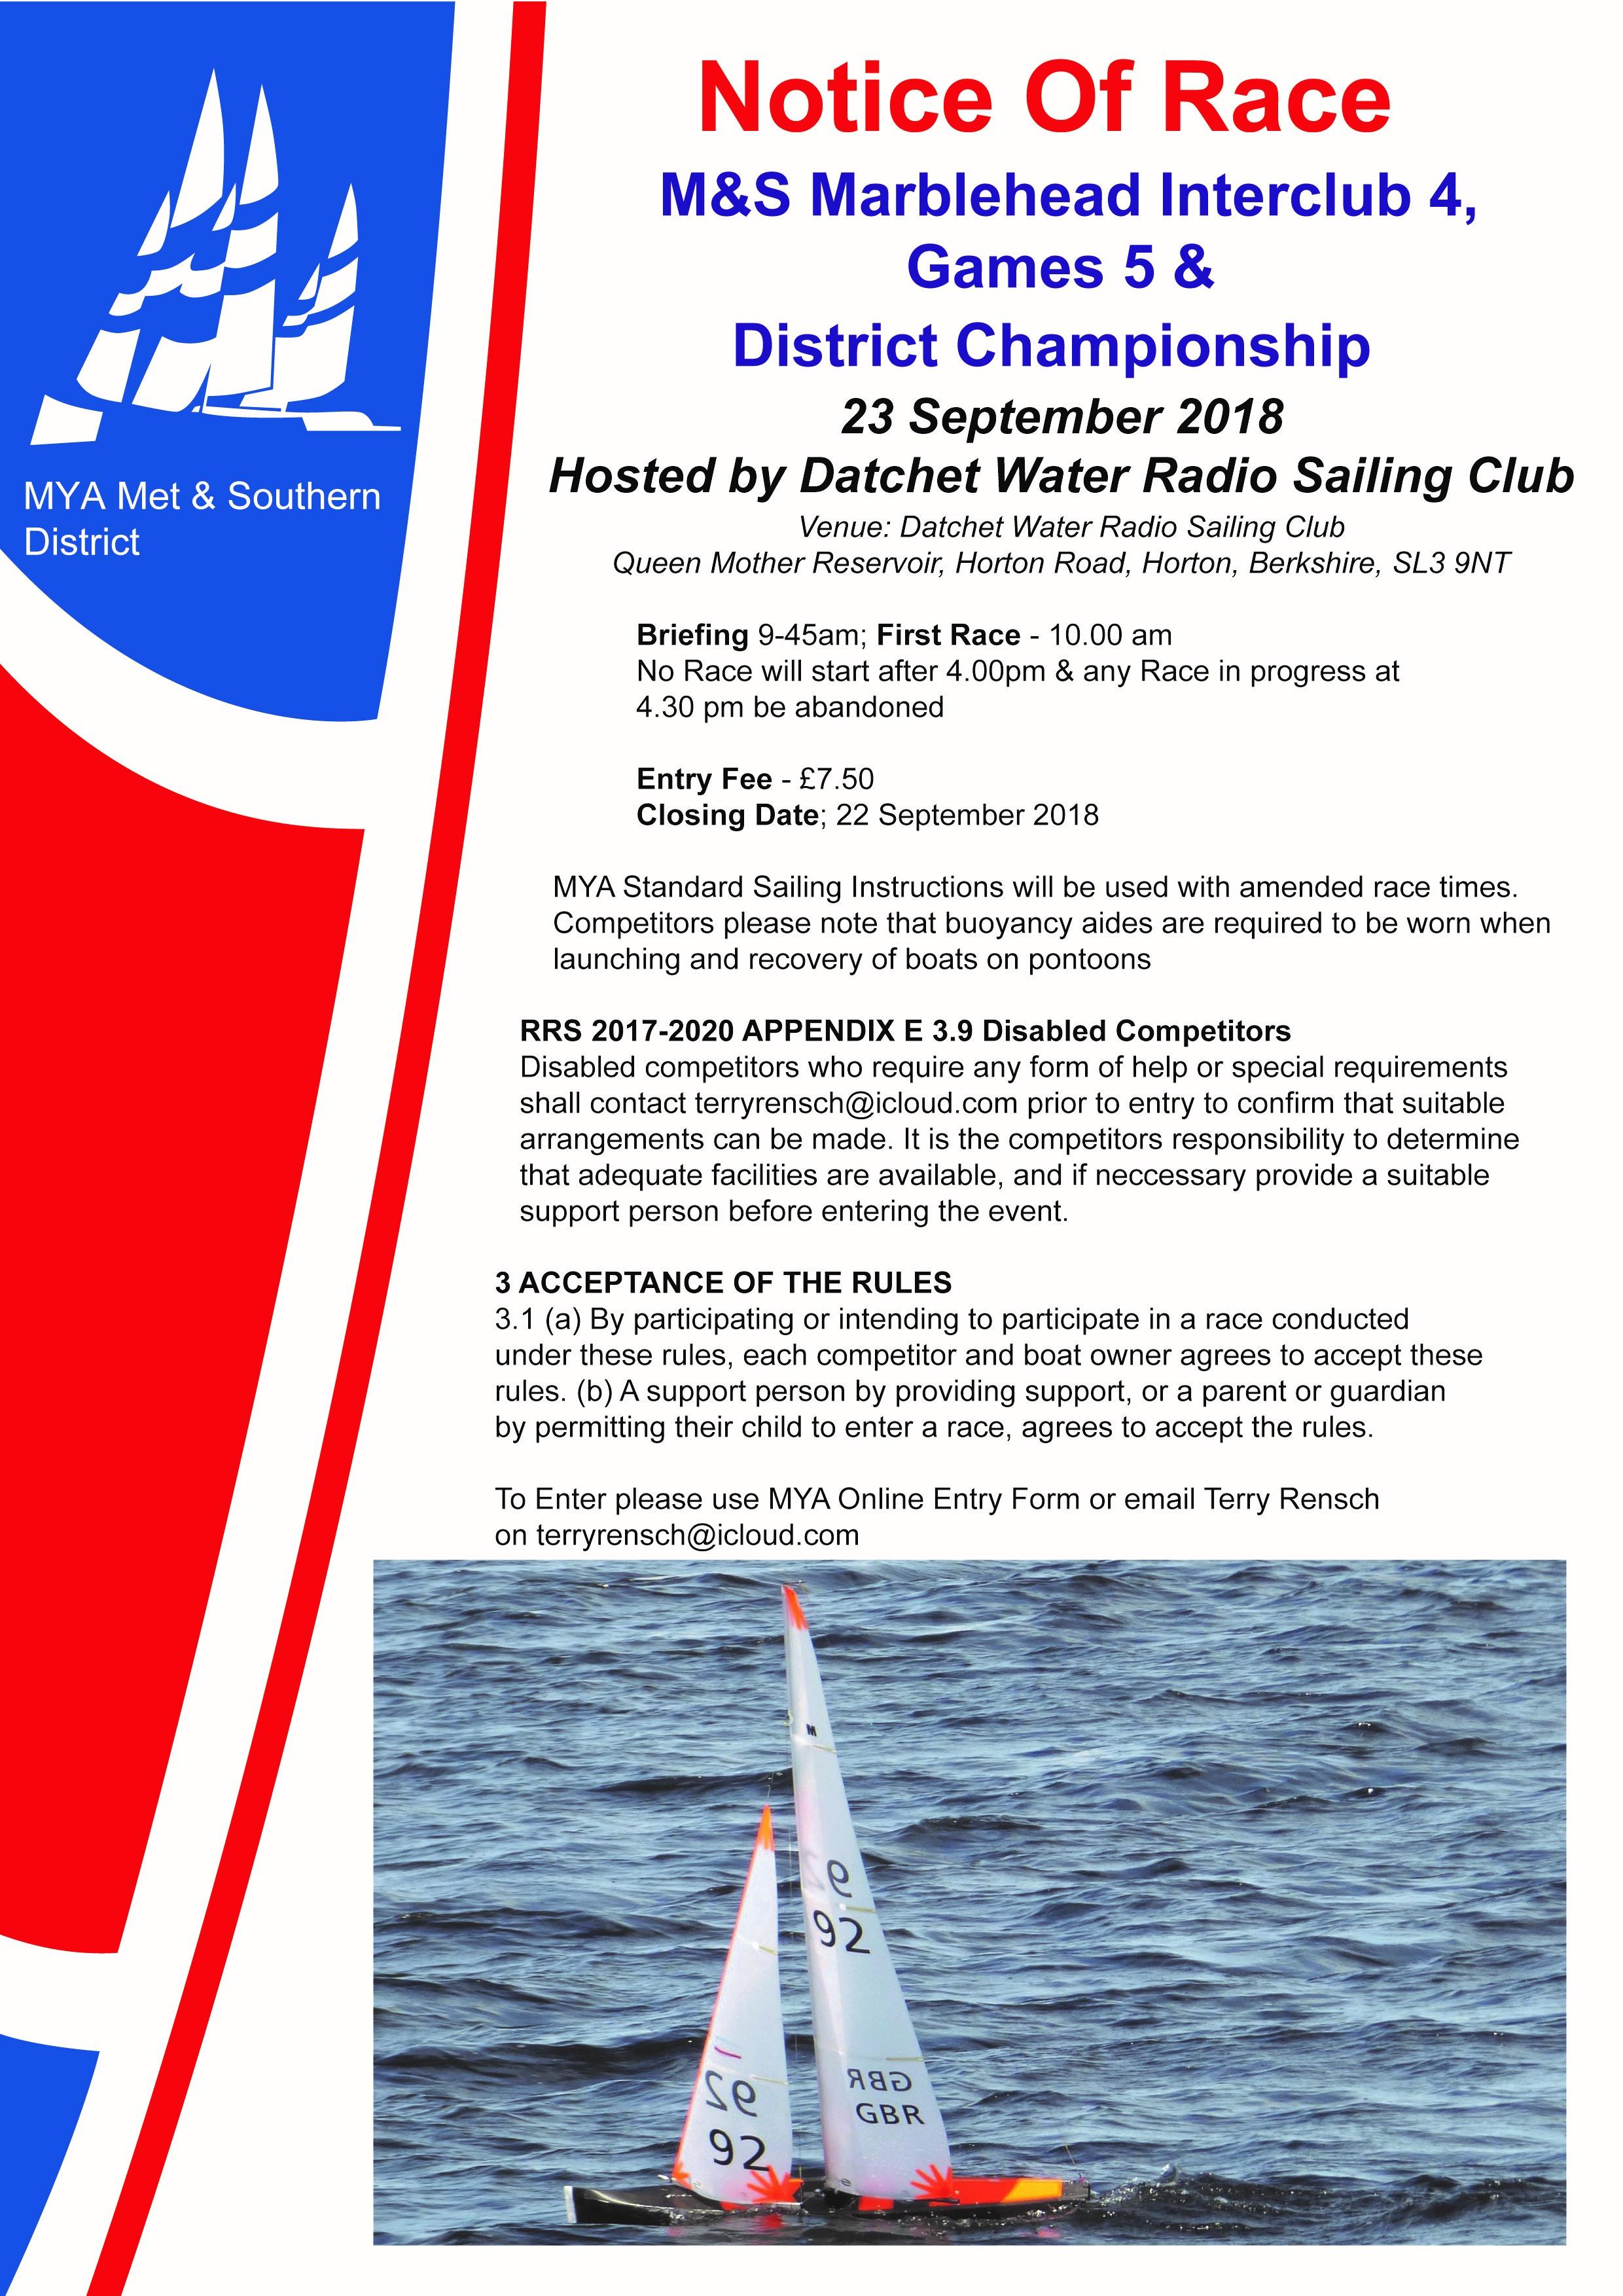 NOR Interclub 4, Games 5 & District Championship